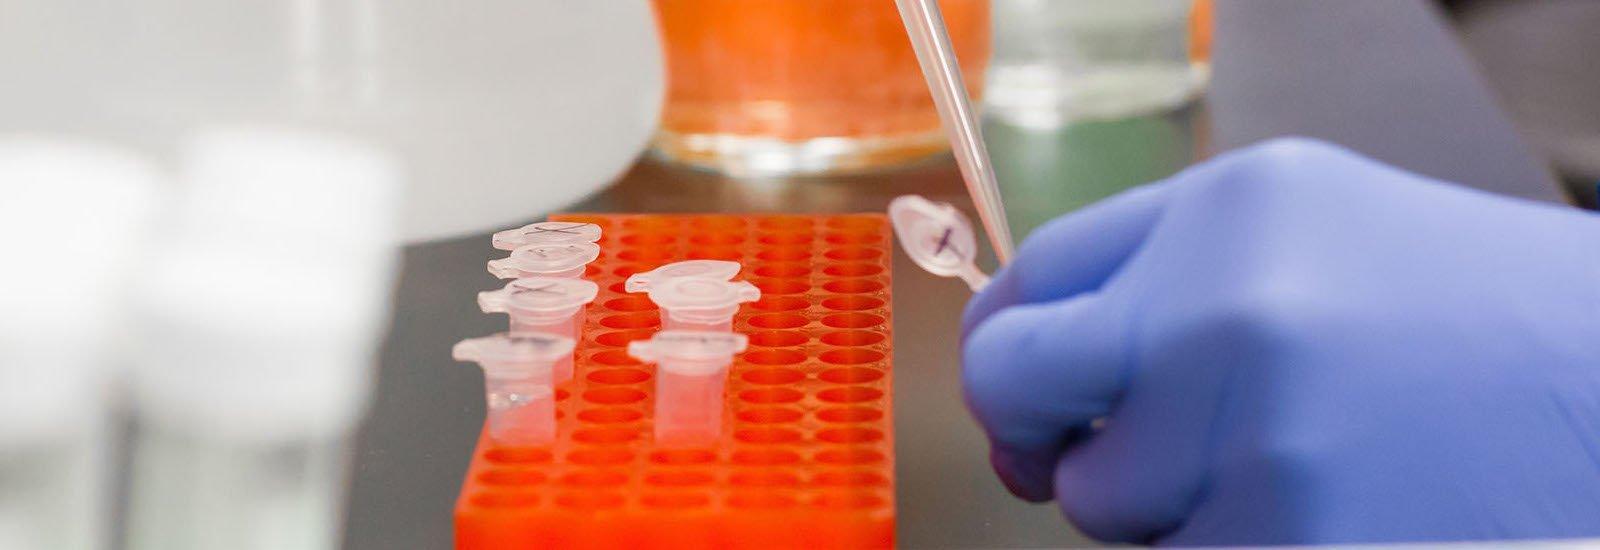 Stock image of biology test tubes